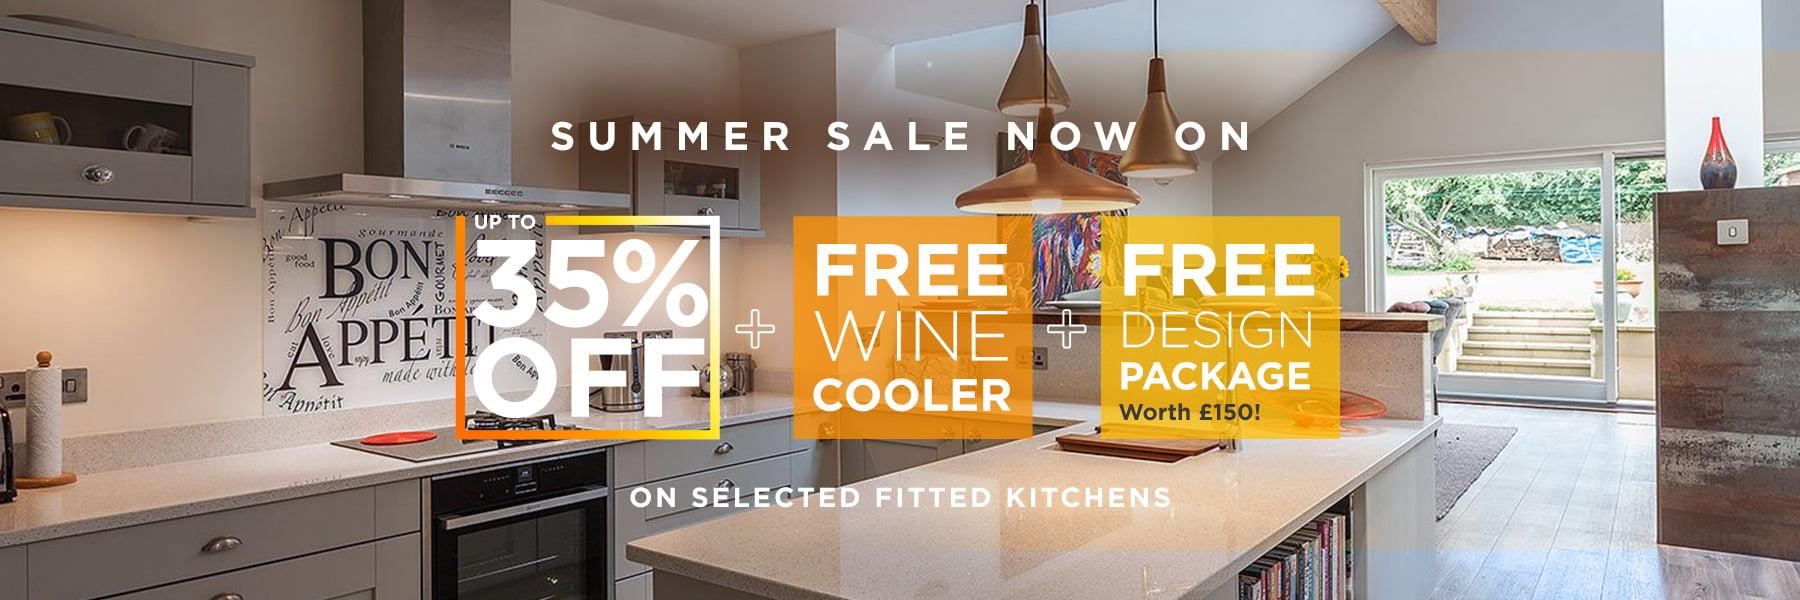 kitchen offer sale sheffield